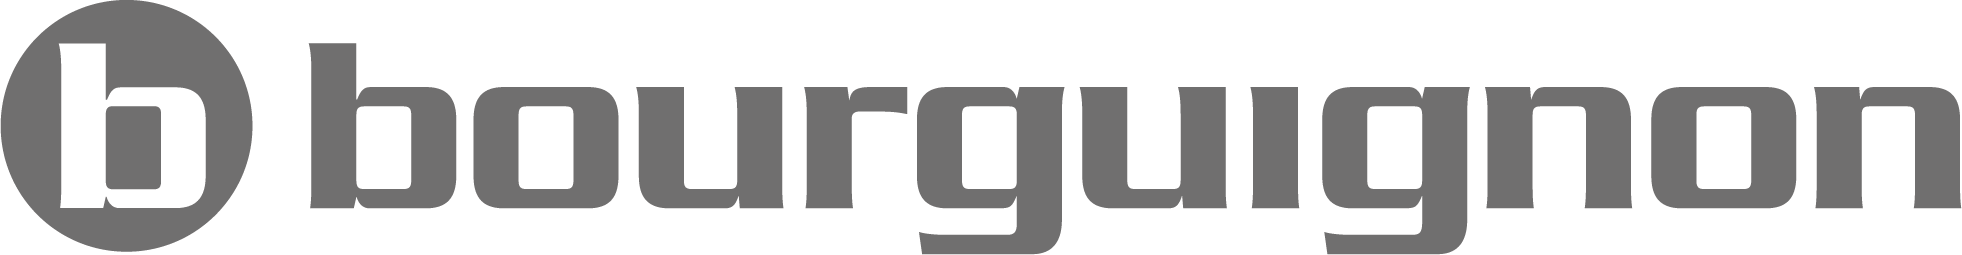 BOURGUIGNON-logo-beeldmerk